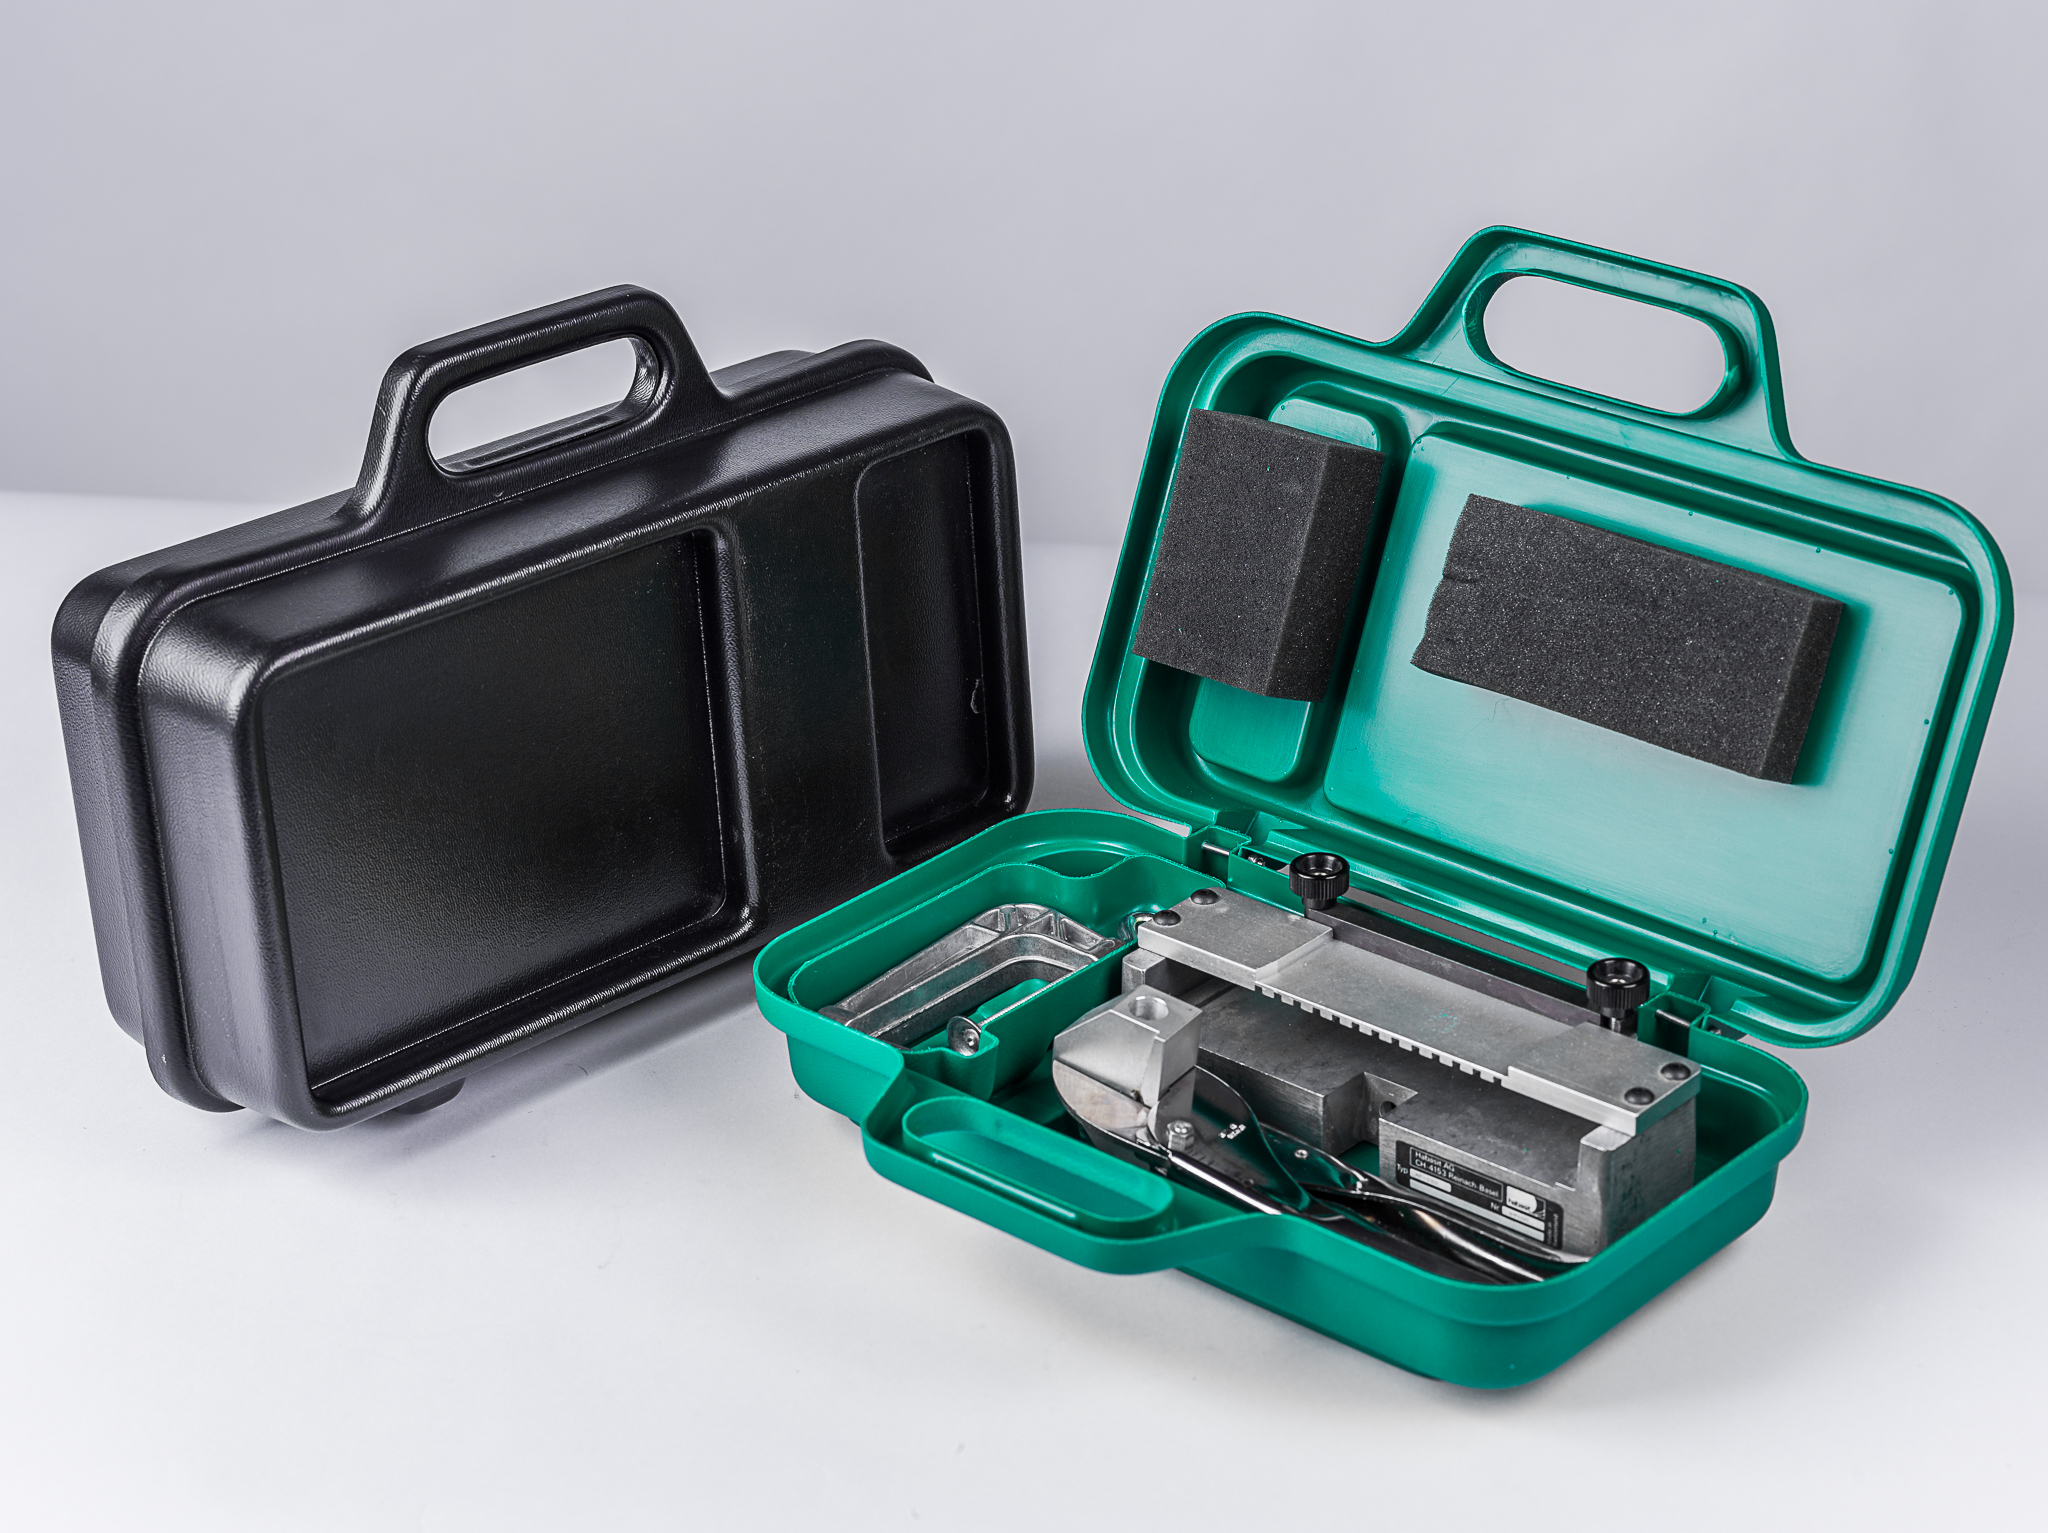 Geräte-Verpackung, bzw. -Präsentations-Koffer aus PS